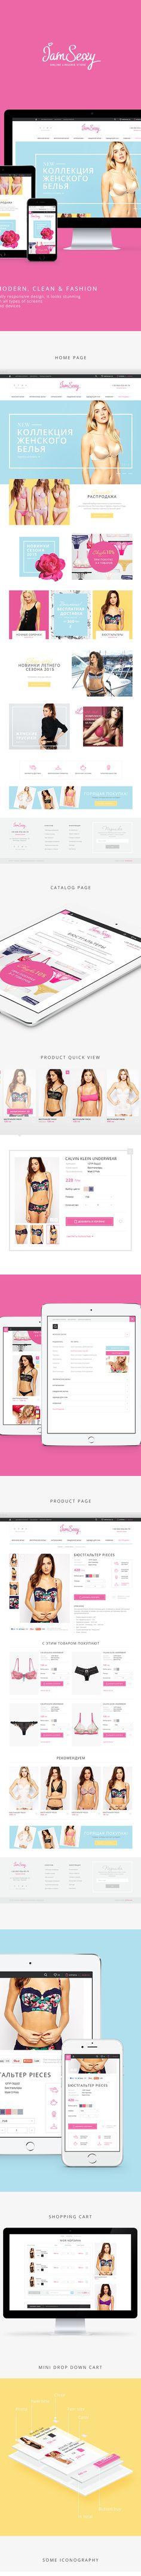 035601a00520 215 Best design images | Chart design, Typography, Graph design